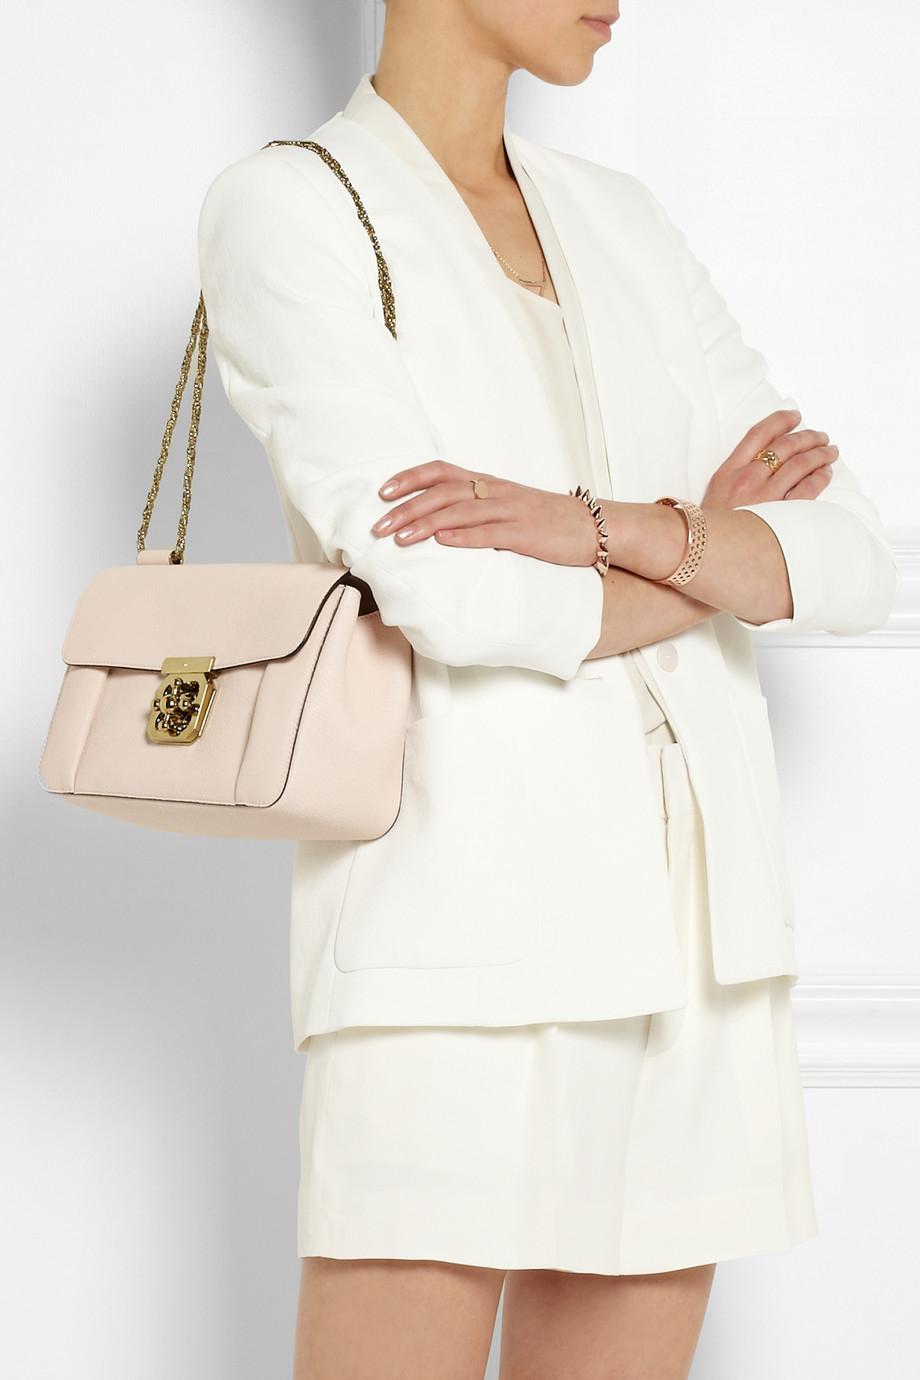 handbag chloe online - chloe elsie handbag